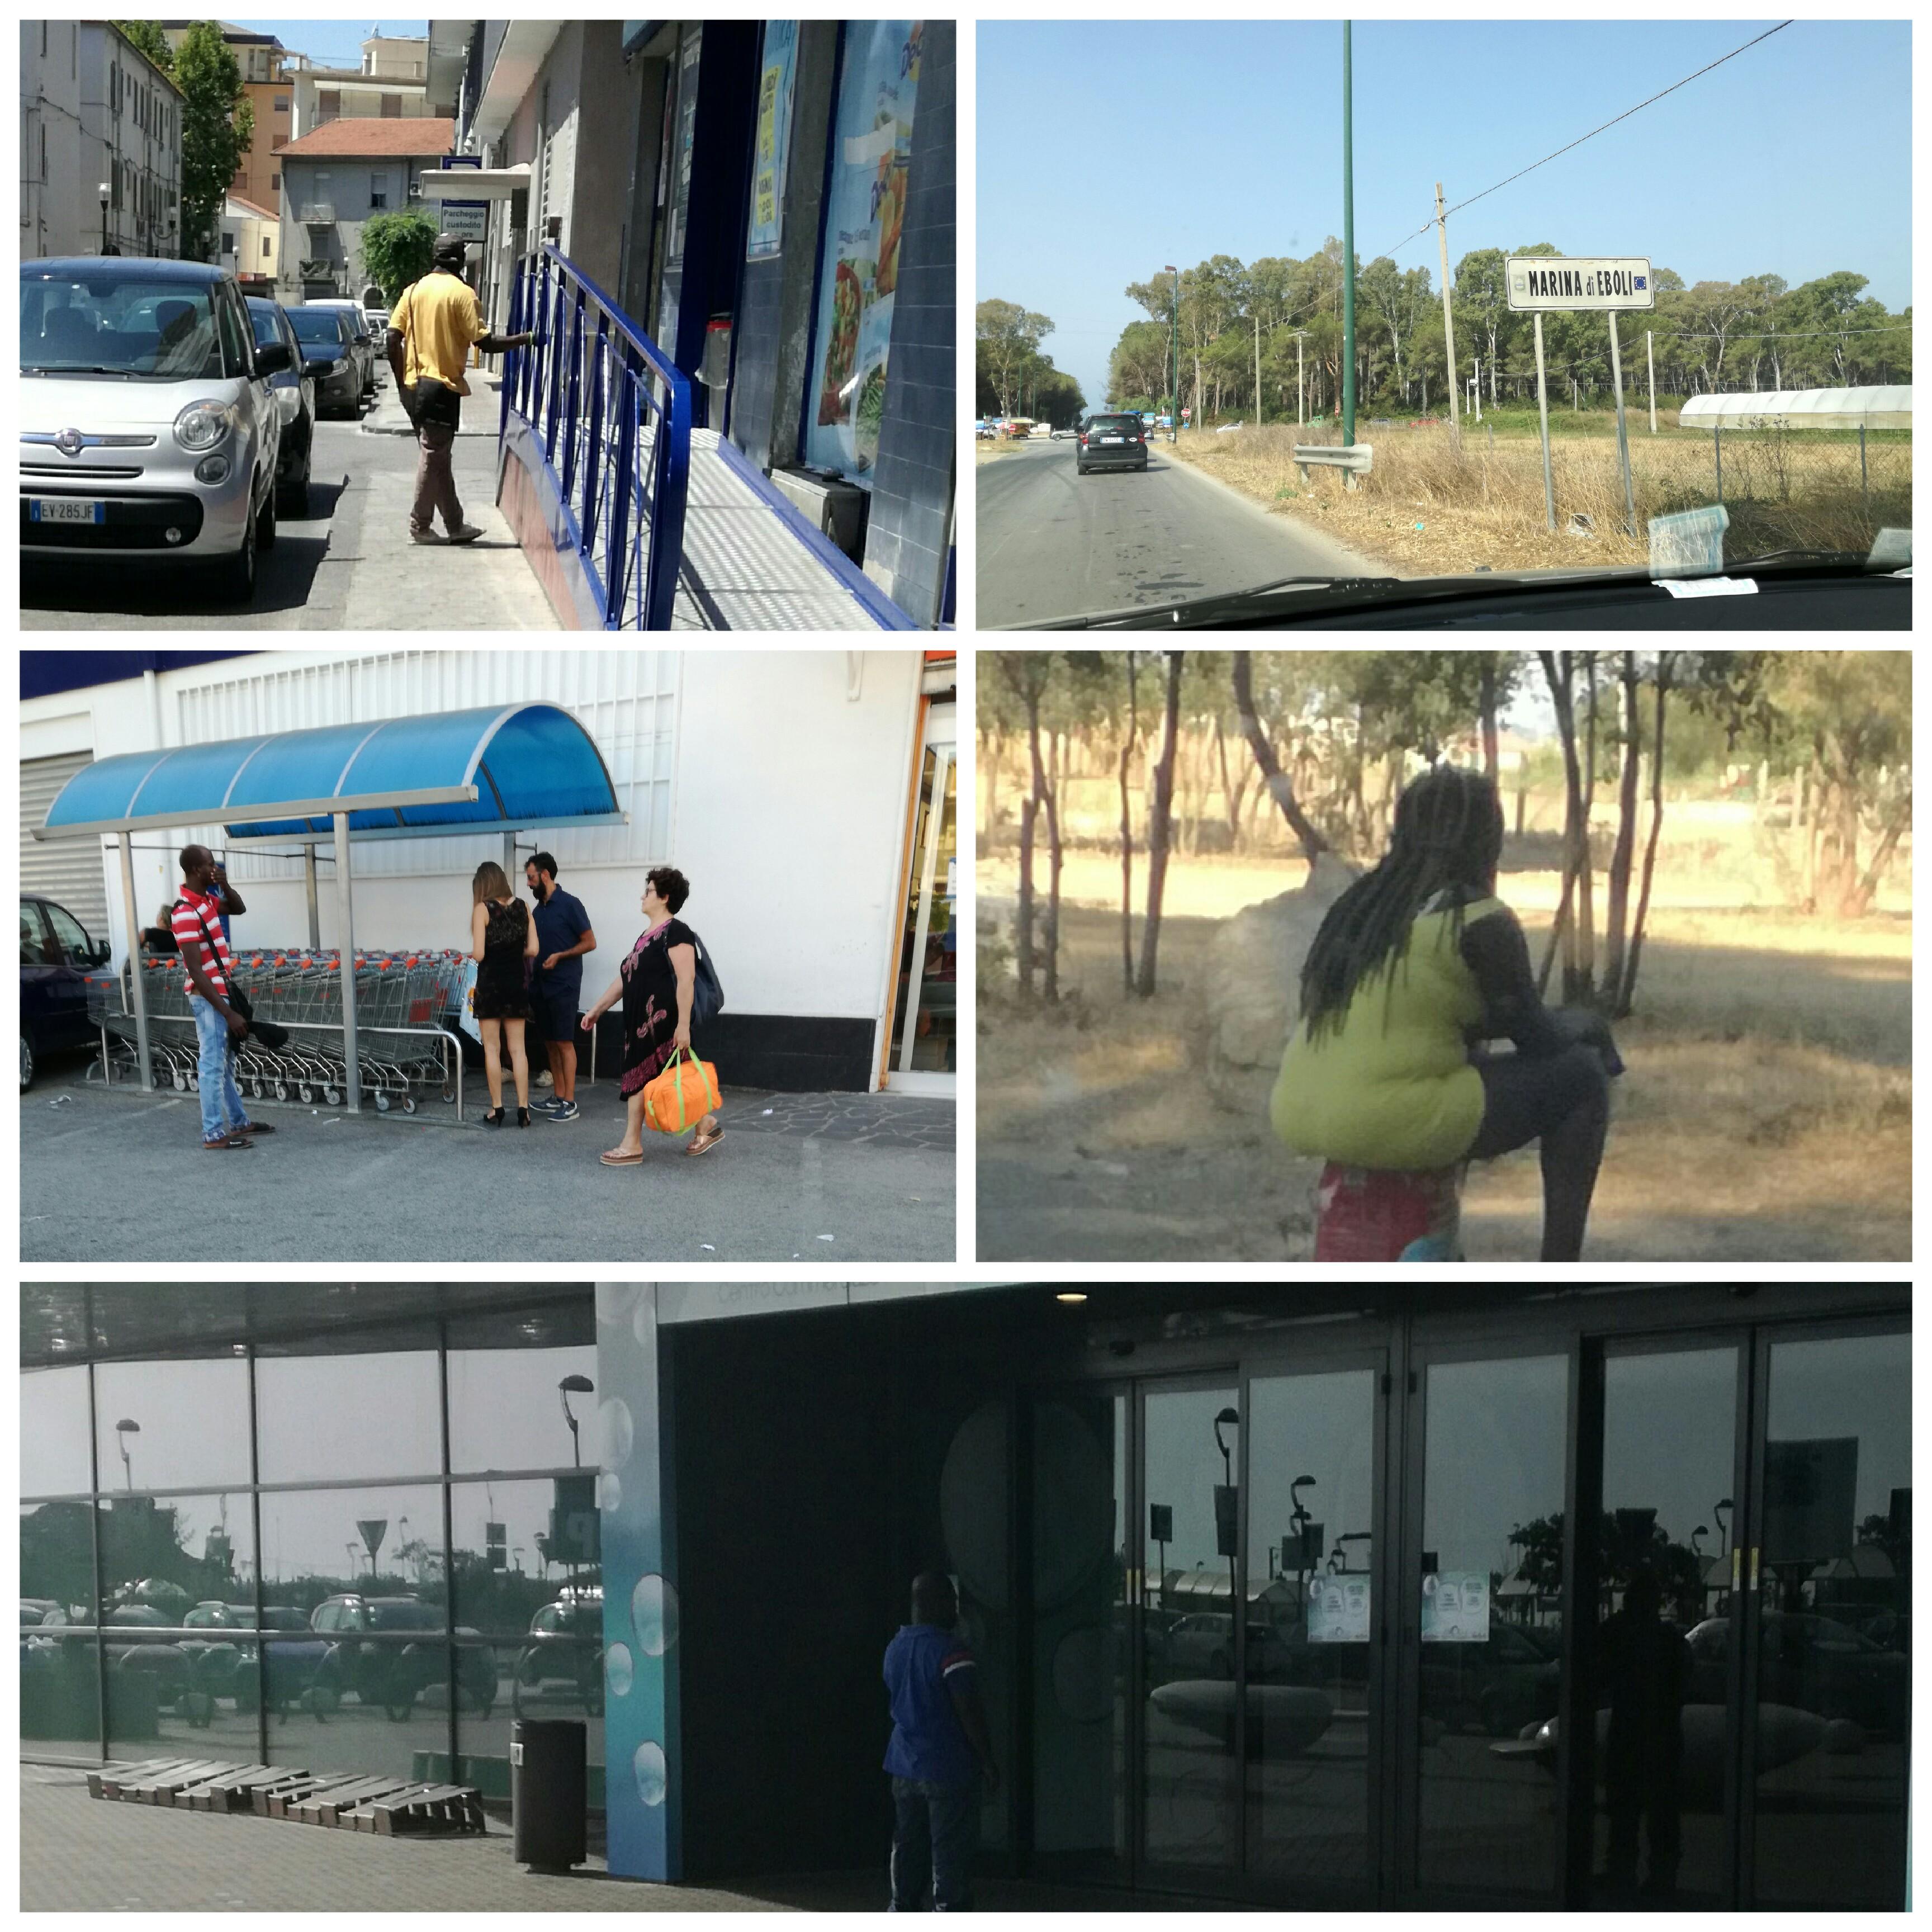 Marina di Eboli-Migranti ai supermercati-prostitute a mare